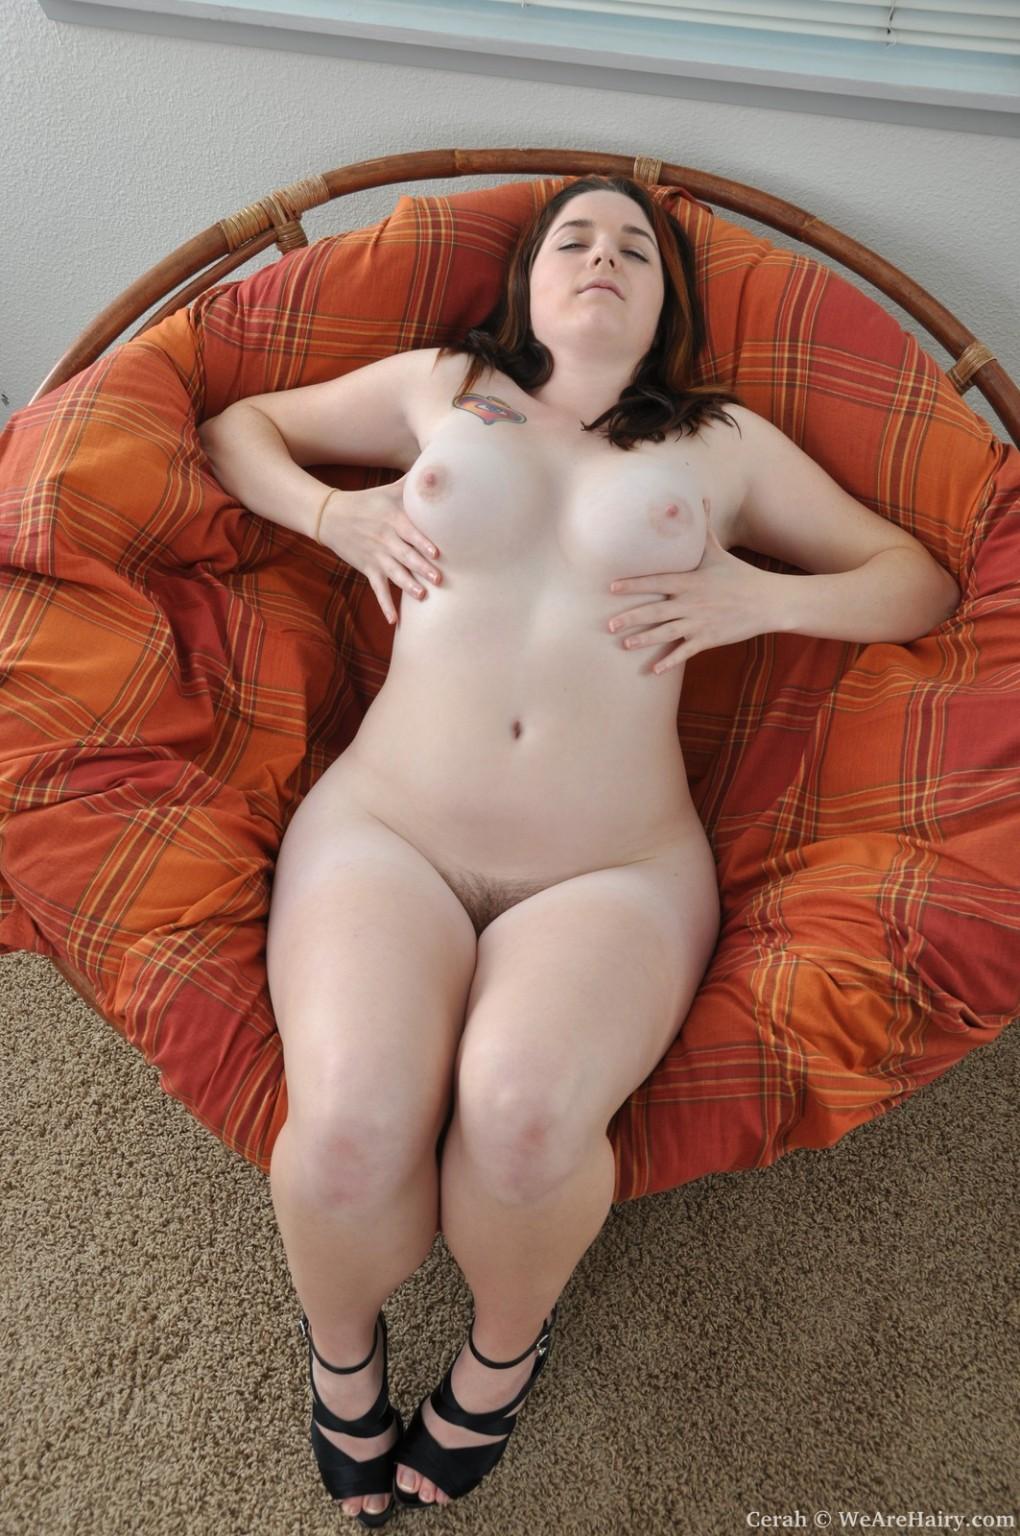 Photos of chubby girl models